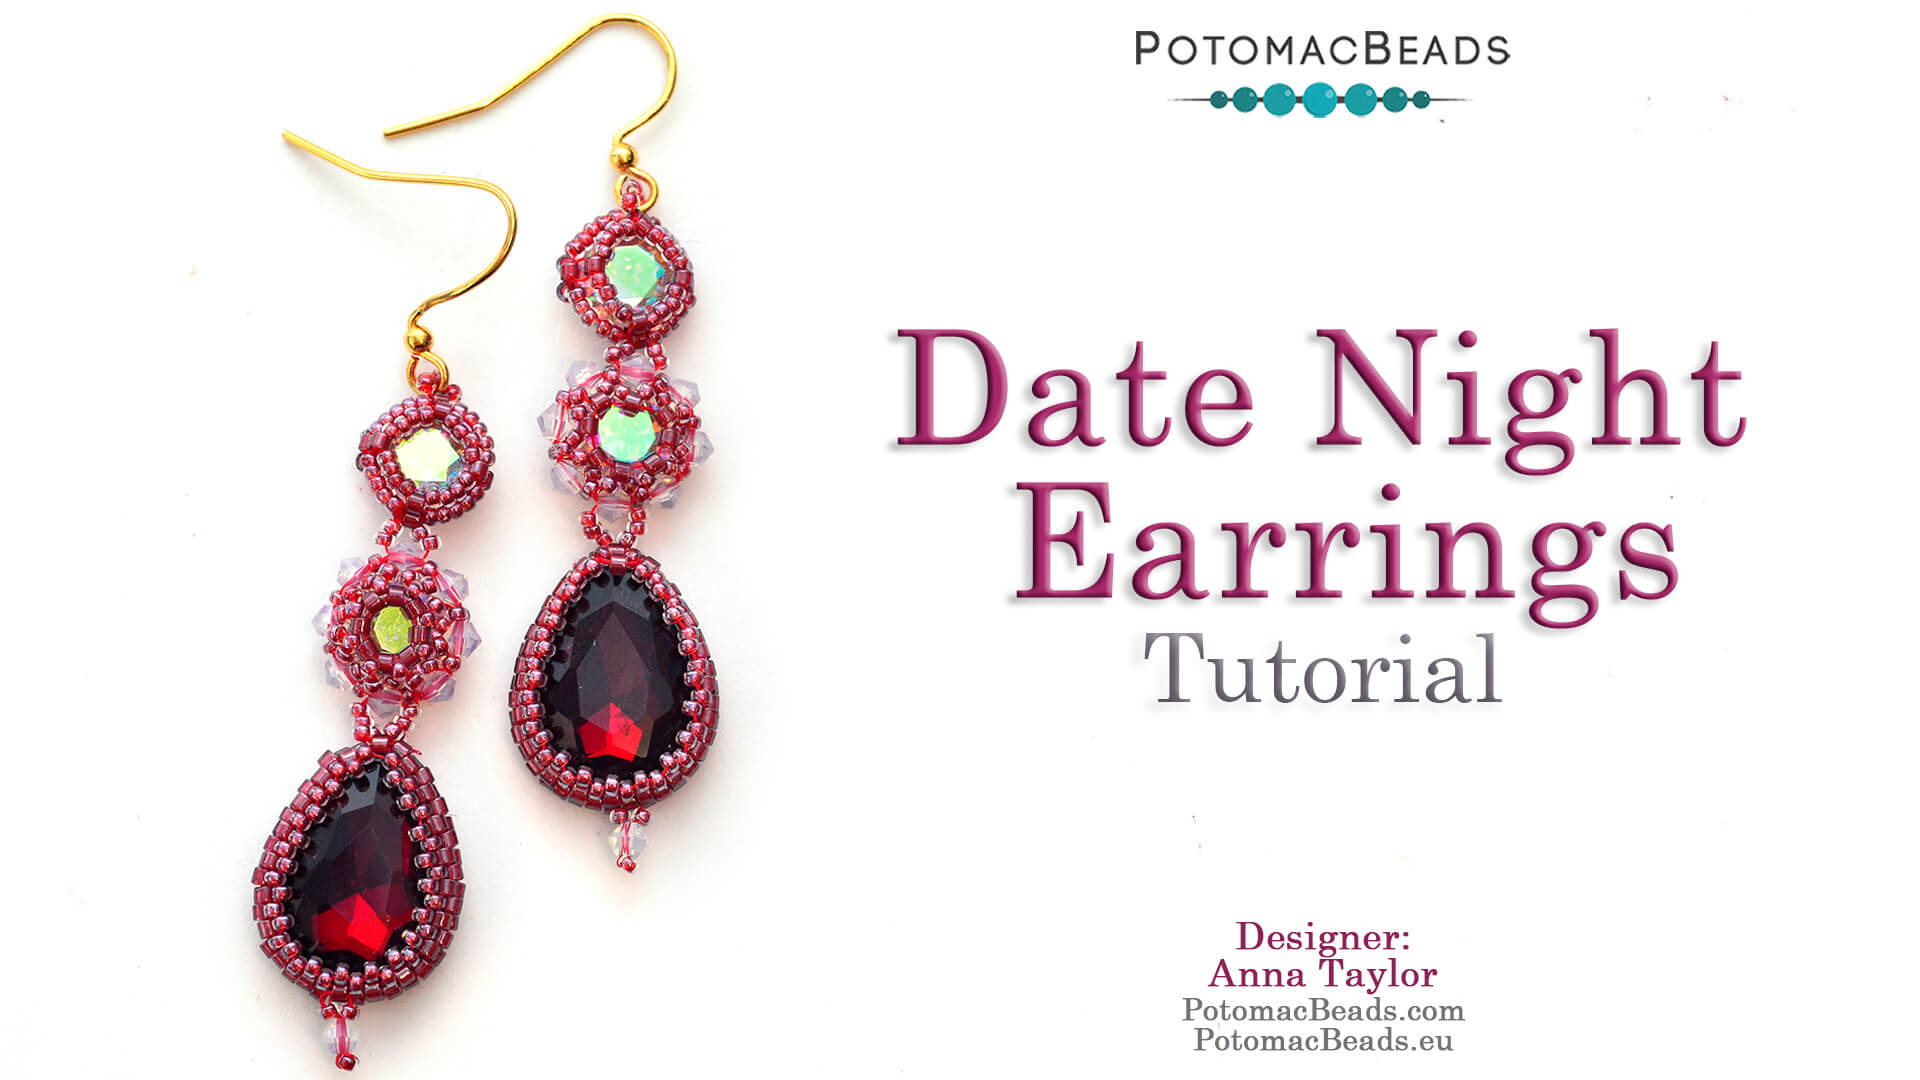 How to Bead Jewelry / Beading Tutorials & Jewel Making Videos / Peyote, Bezel & Netting Videos / Date Night Earrings Tutorial